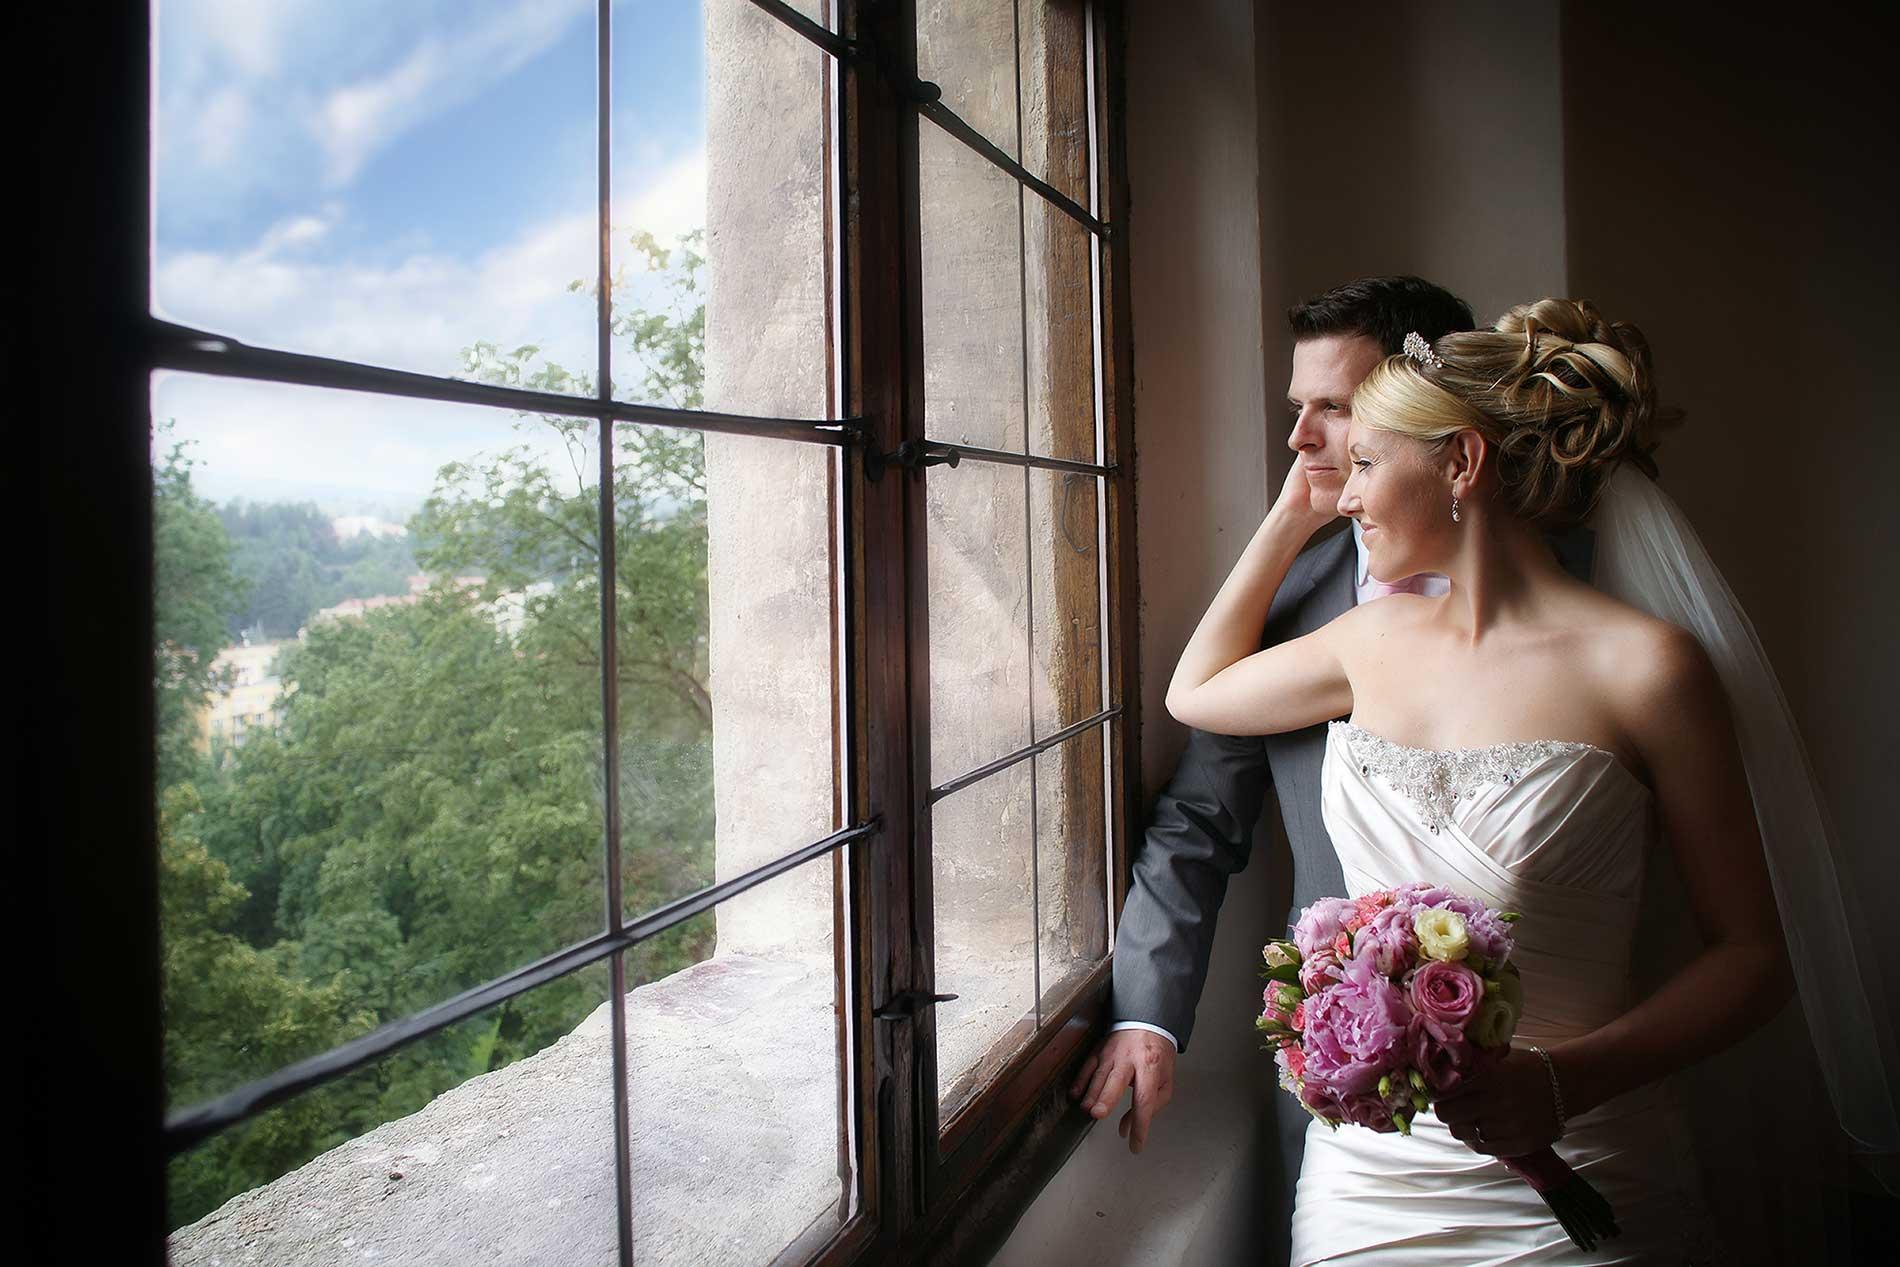 30 svatebni fotografie wedding in cesky krumlov zlata koruna trebon ceske budejovice jihocesky kraj jizni cechy svatebni fotograf lipno nad vltavou potret tehotenske foto svatby